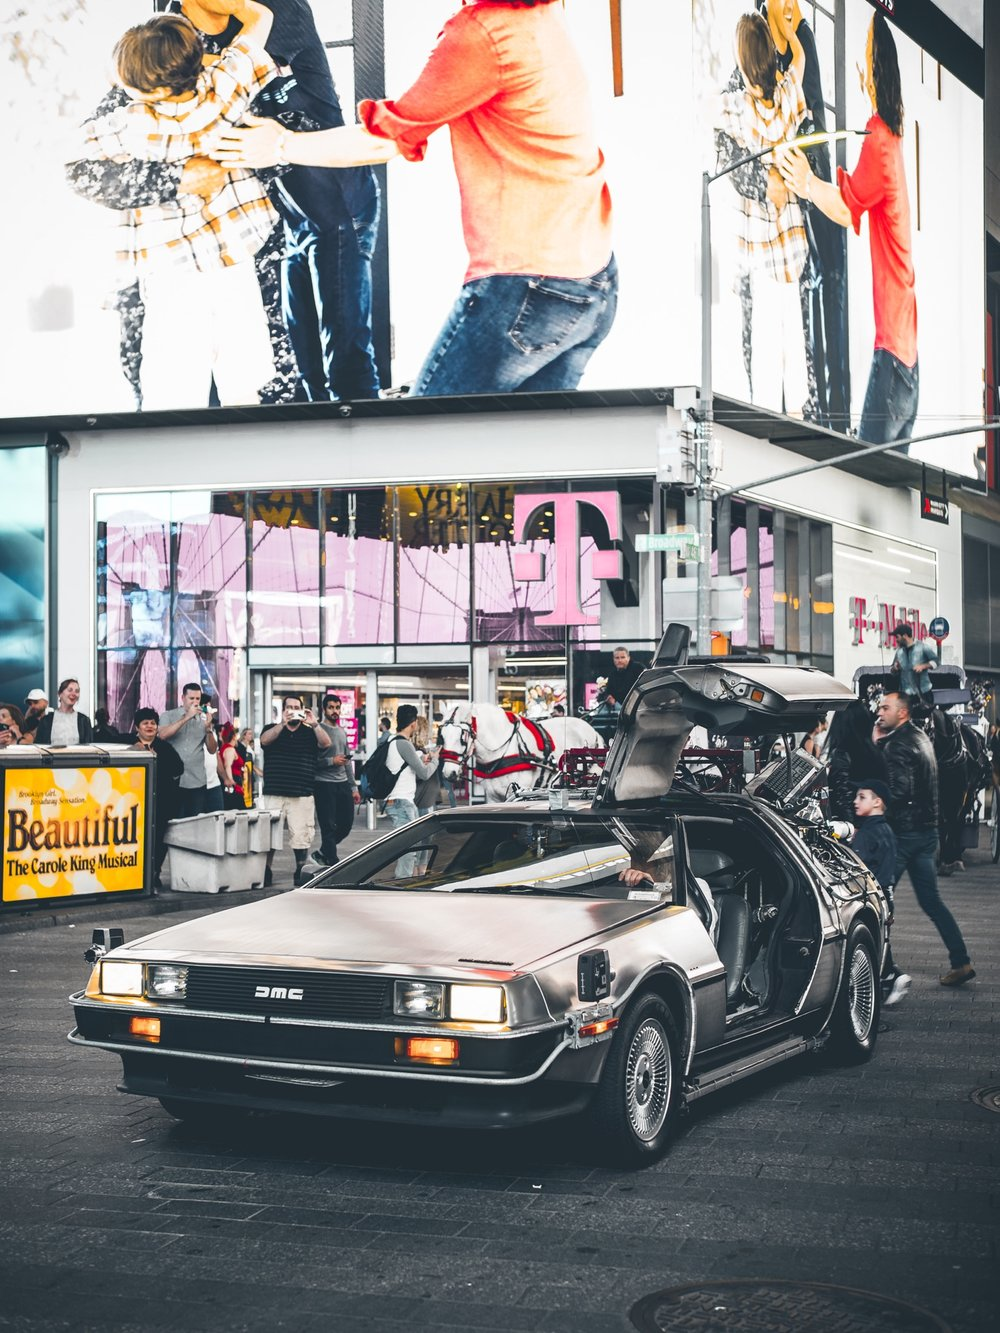 Delorean Back to the Future Times Square NYC New York City